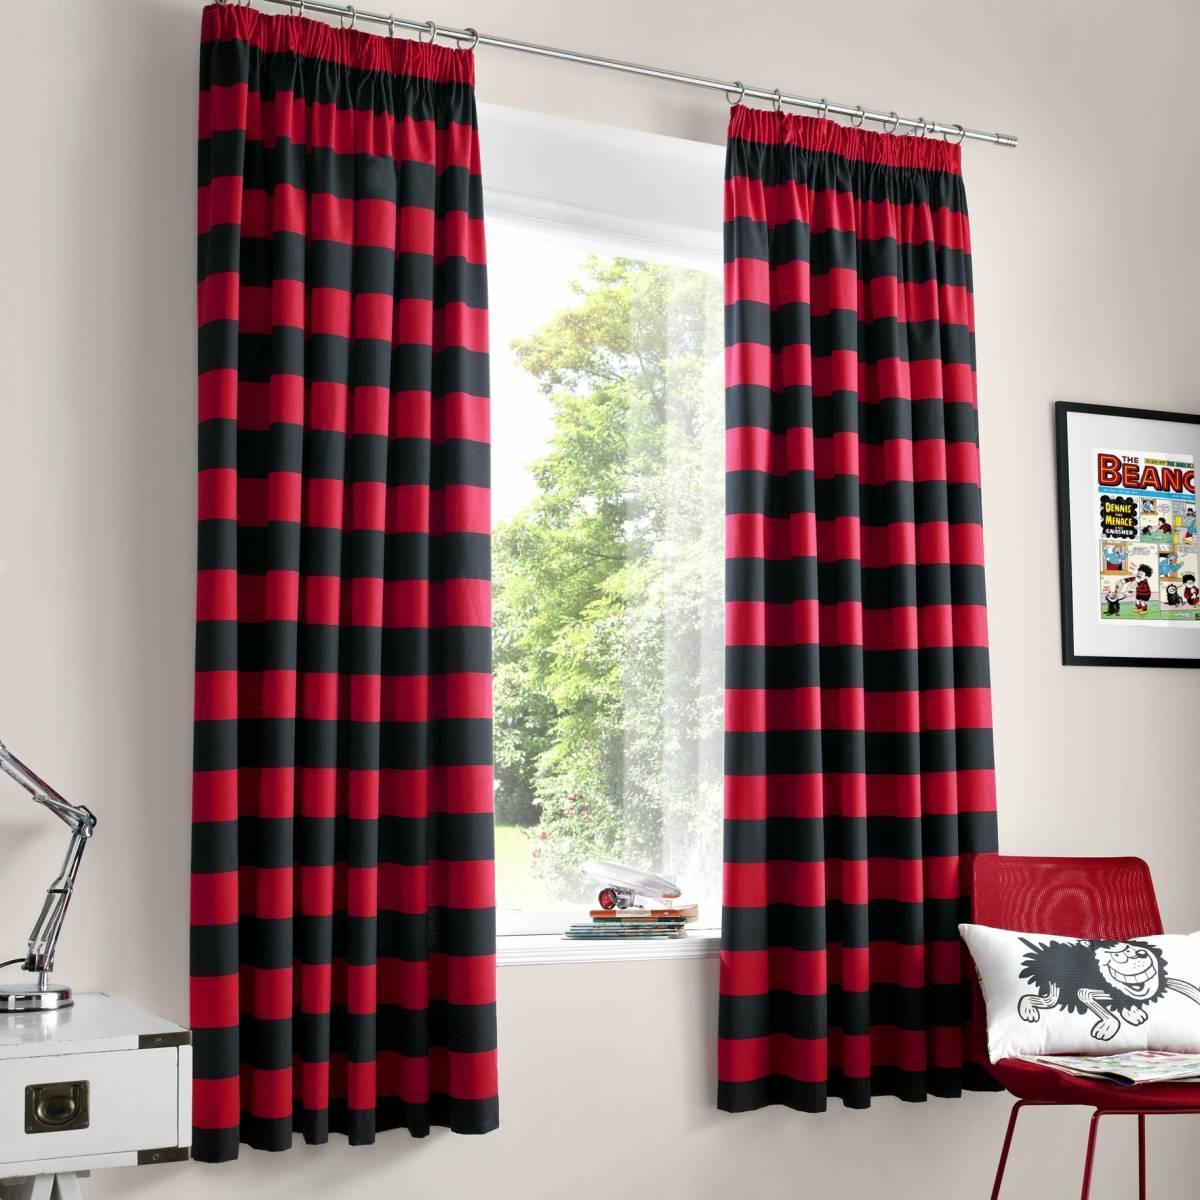 1361300748-45781600 20+ Hottest Curtain Design Ideas for 2020